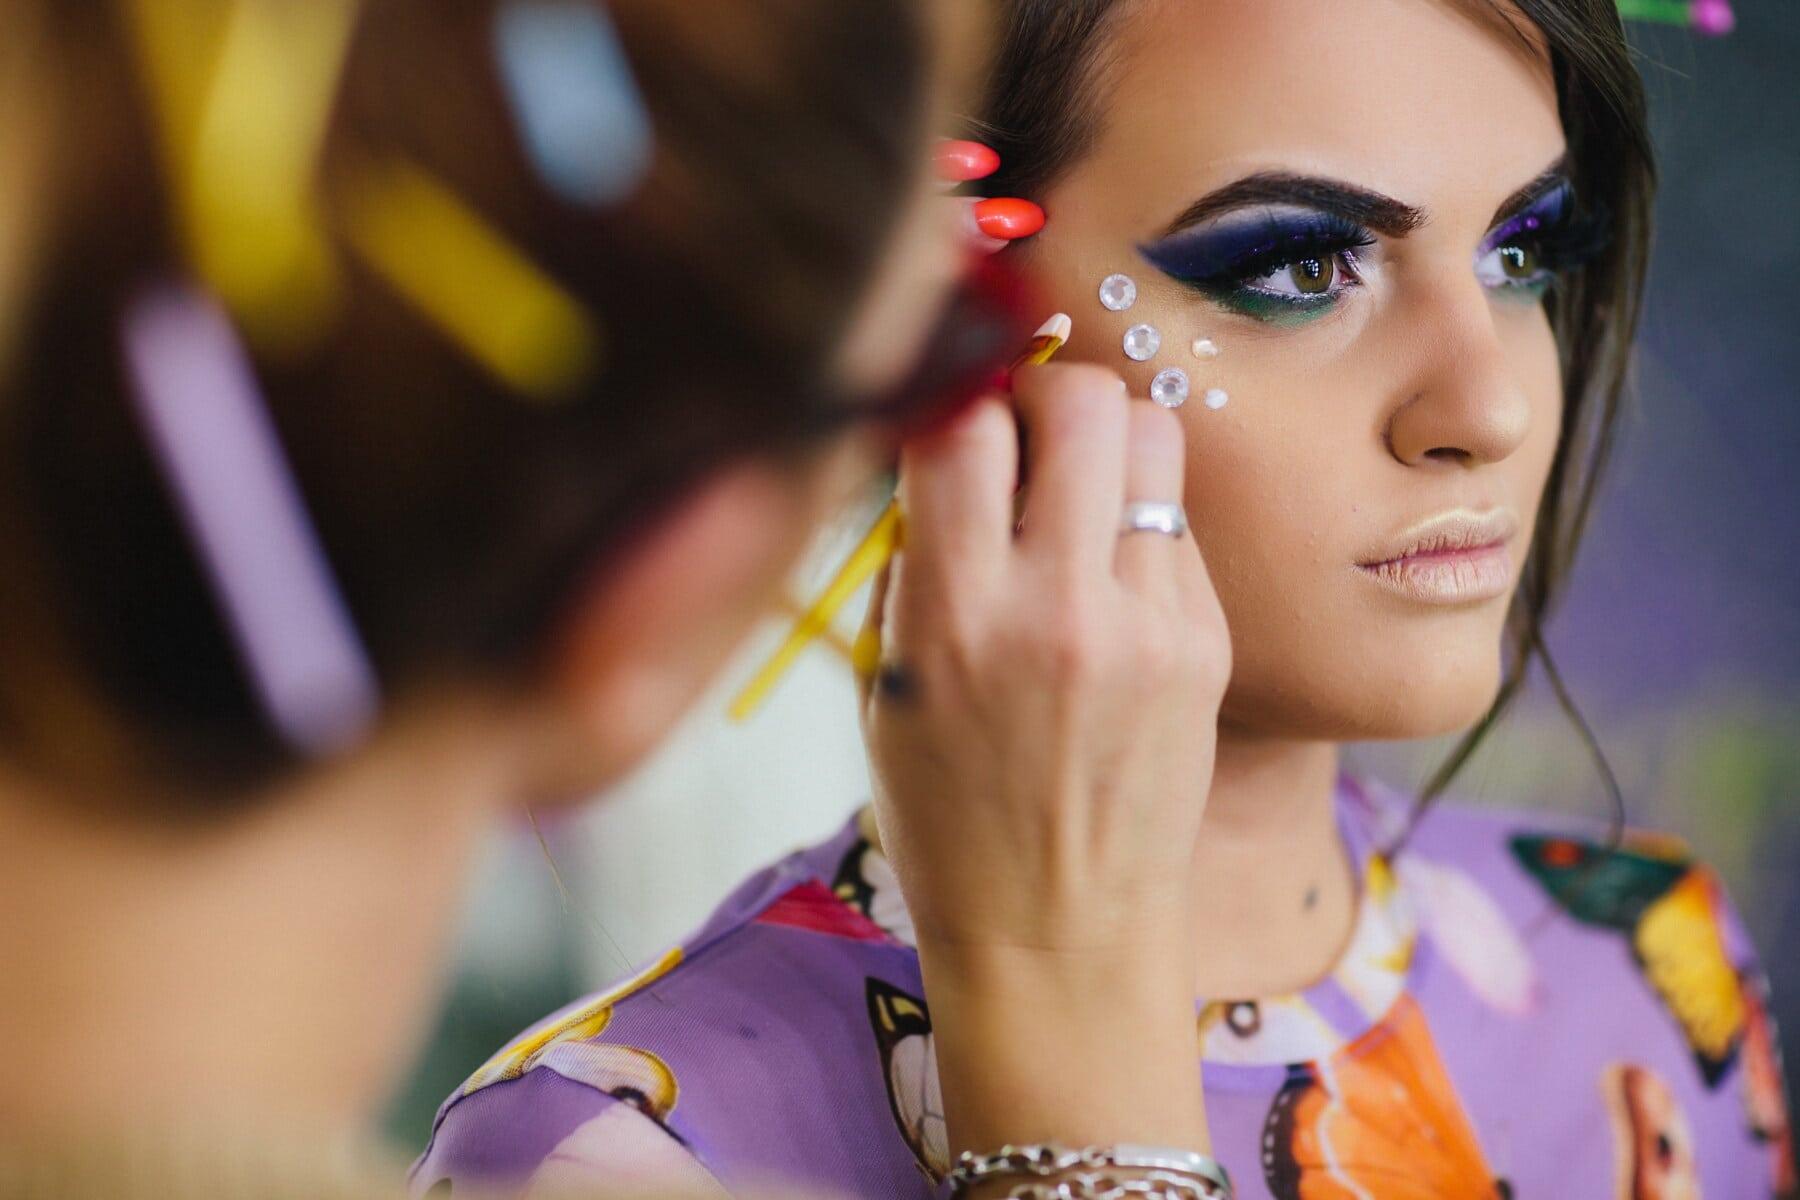 pretty girl, cosmetics, salon, artwork, art, makeup, body, beautician, shop, portrait